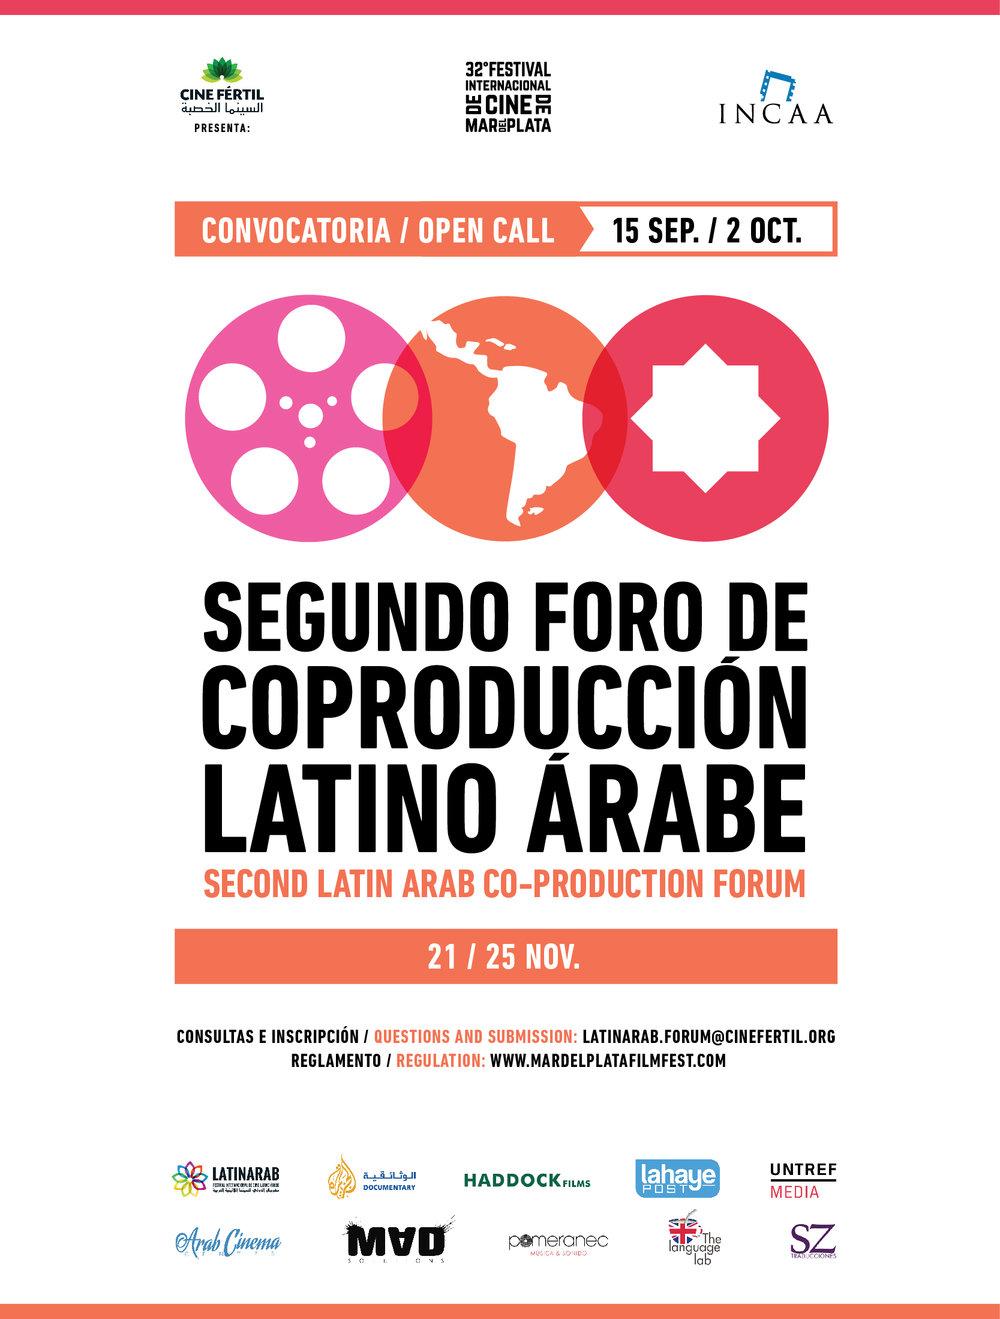 latinarab_flyer (3).jpg